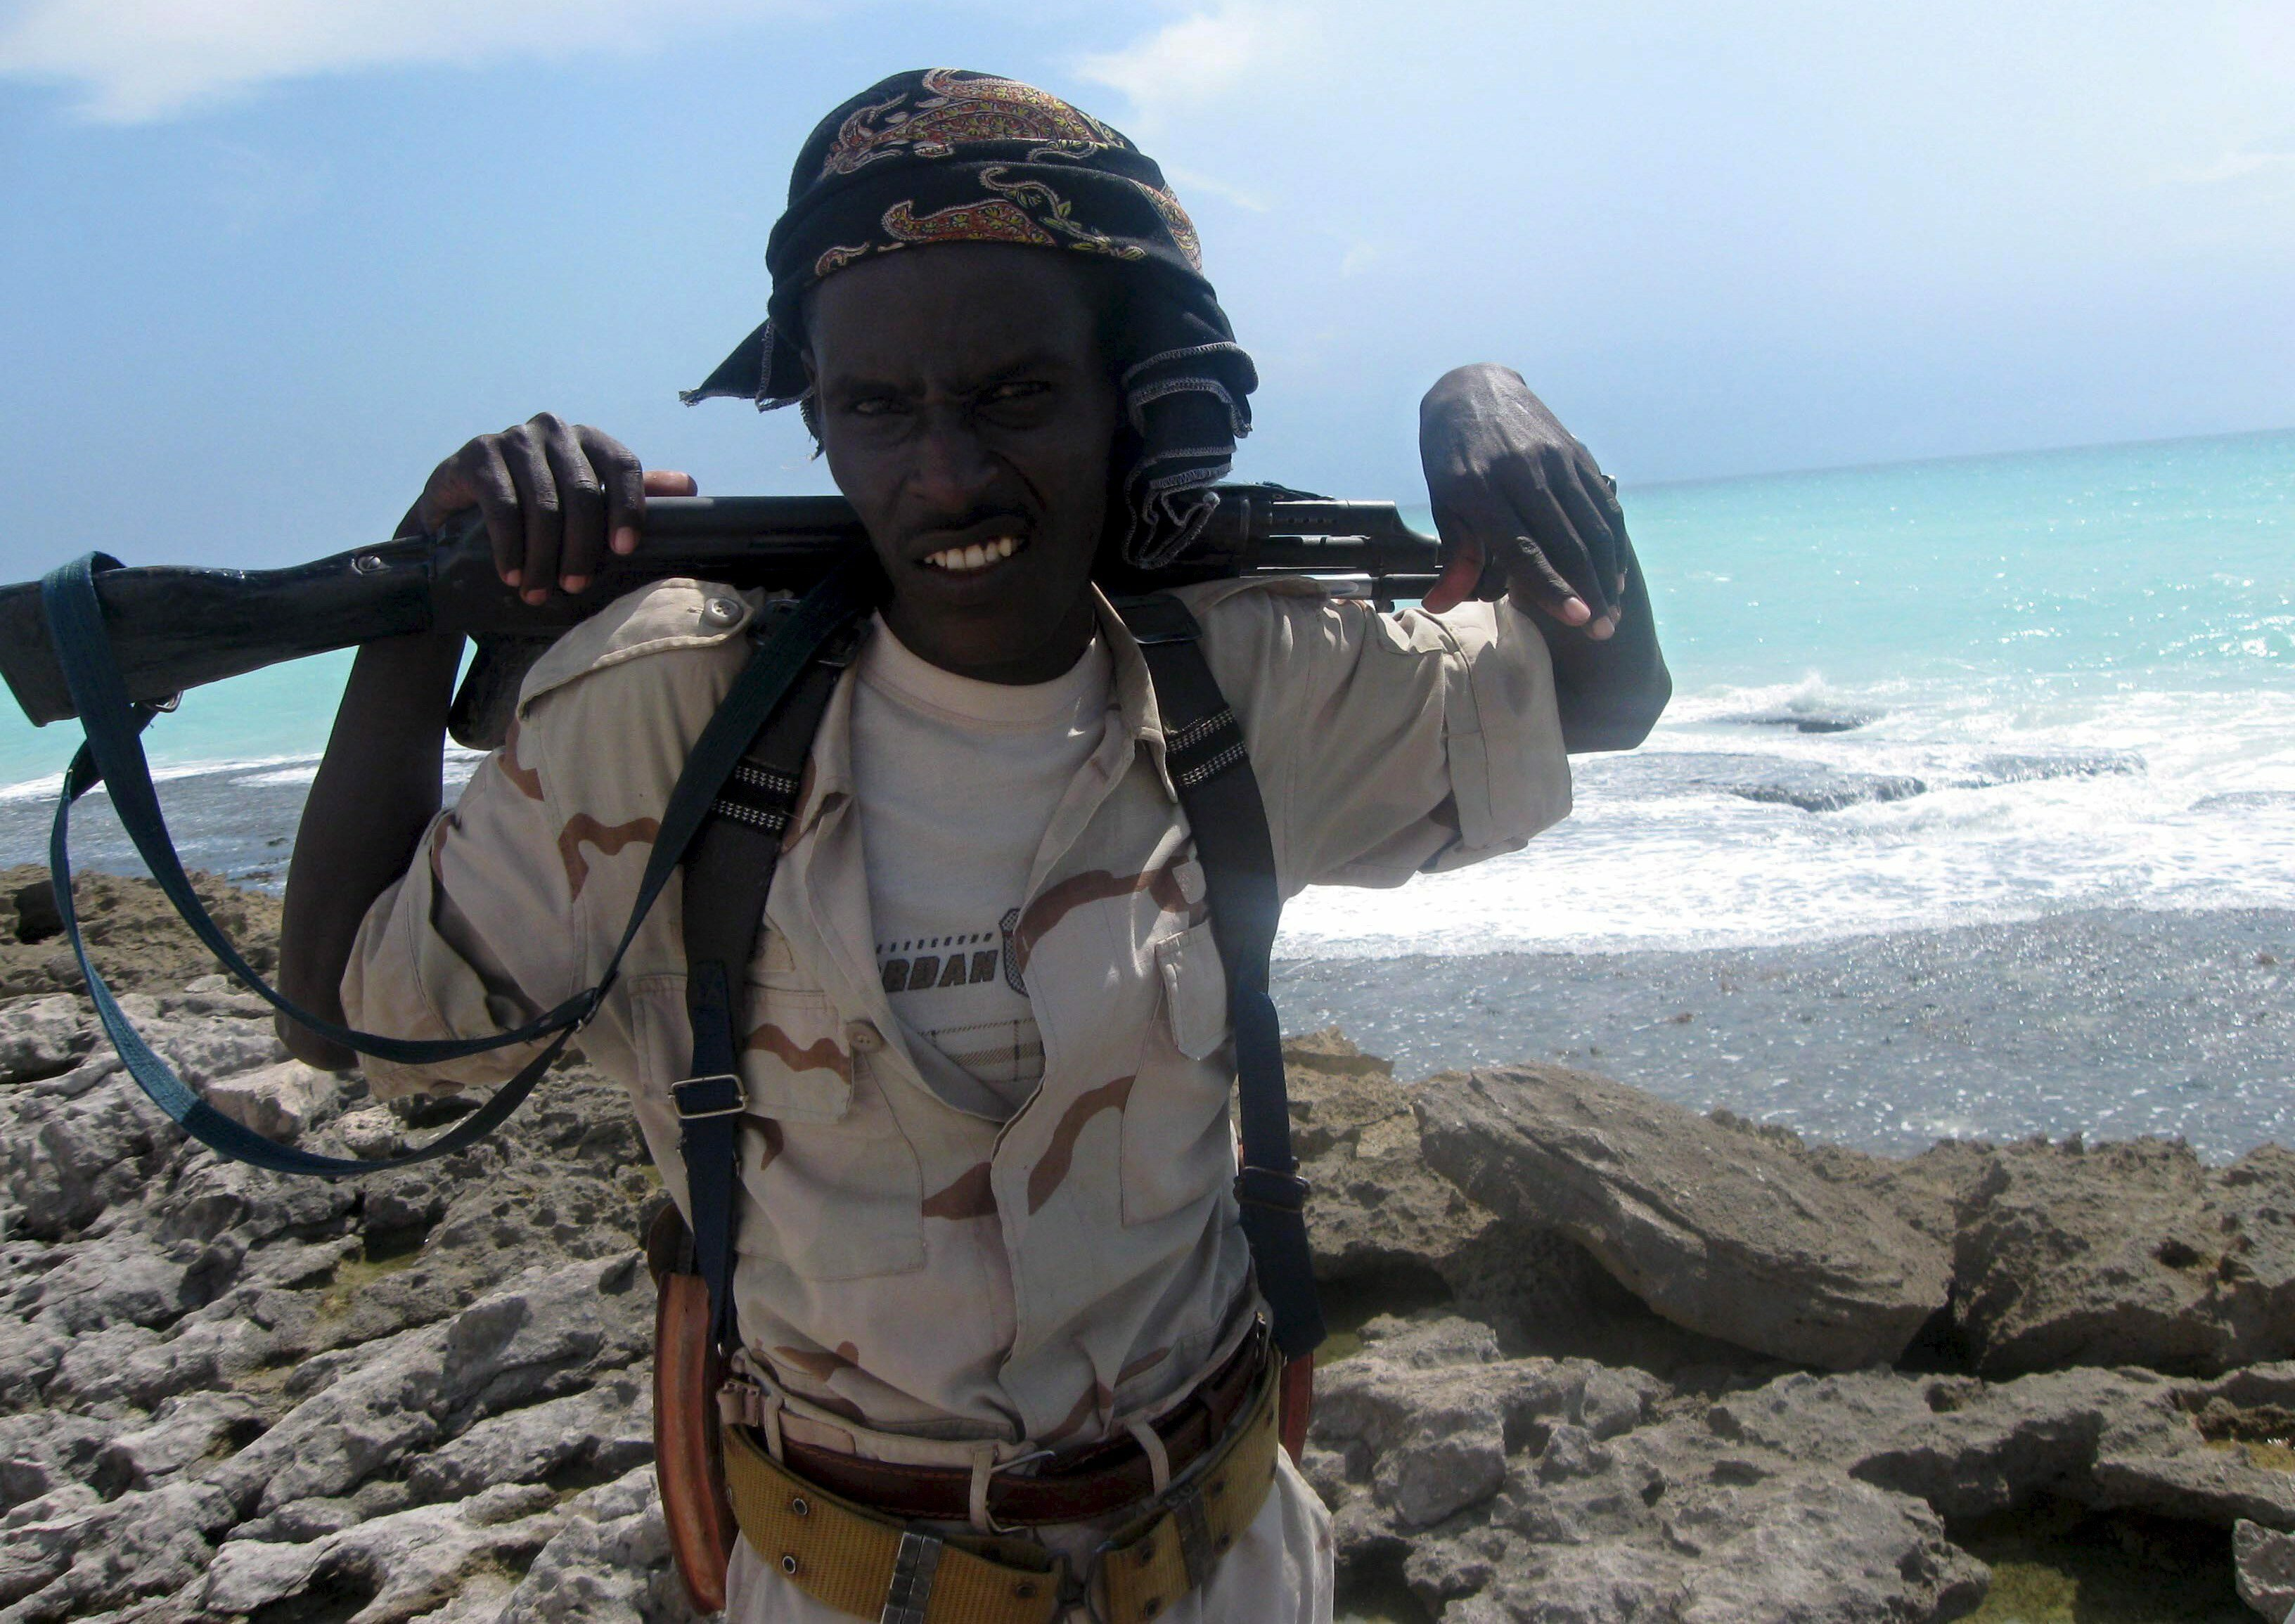 SOMALIA PIRACY